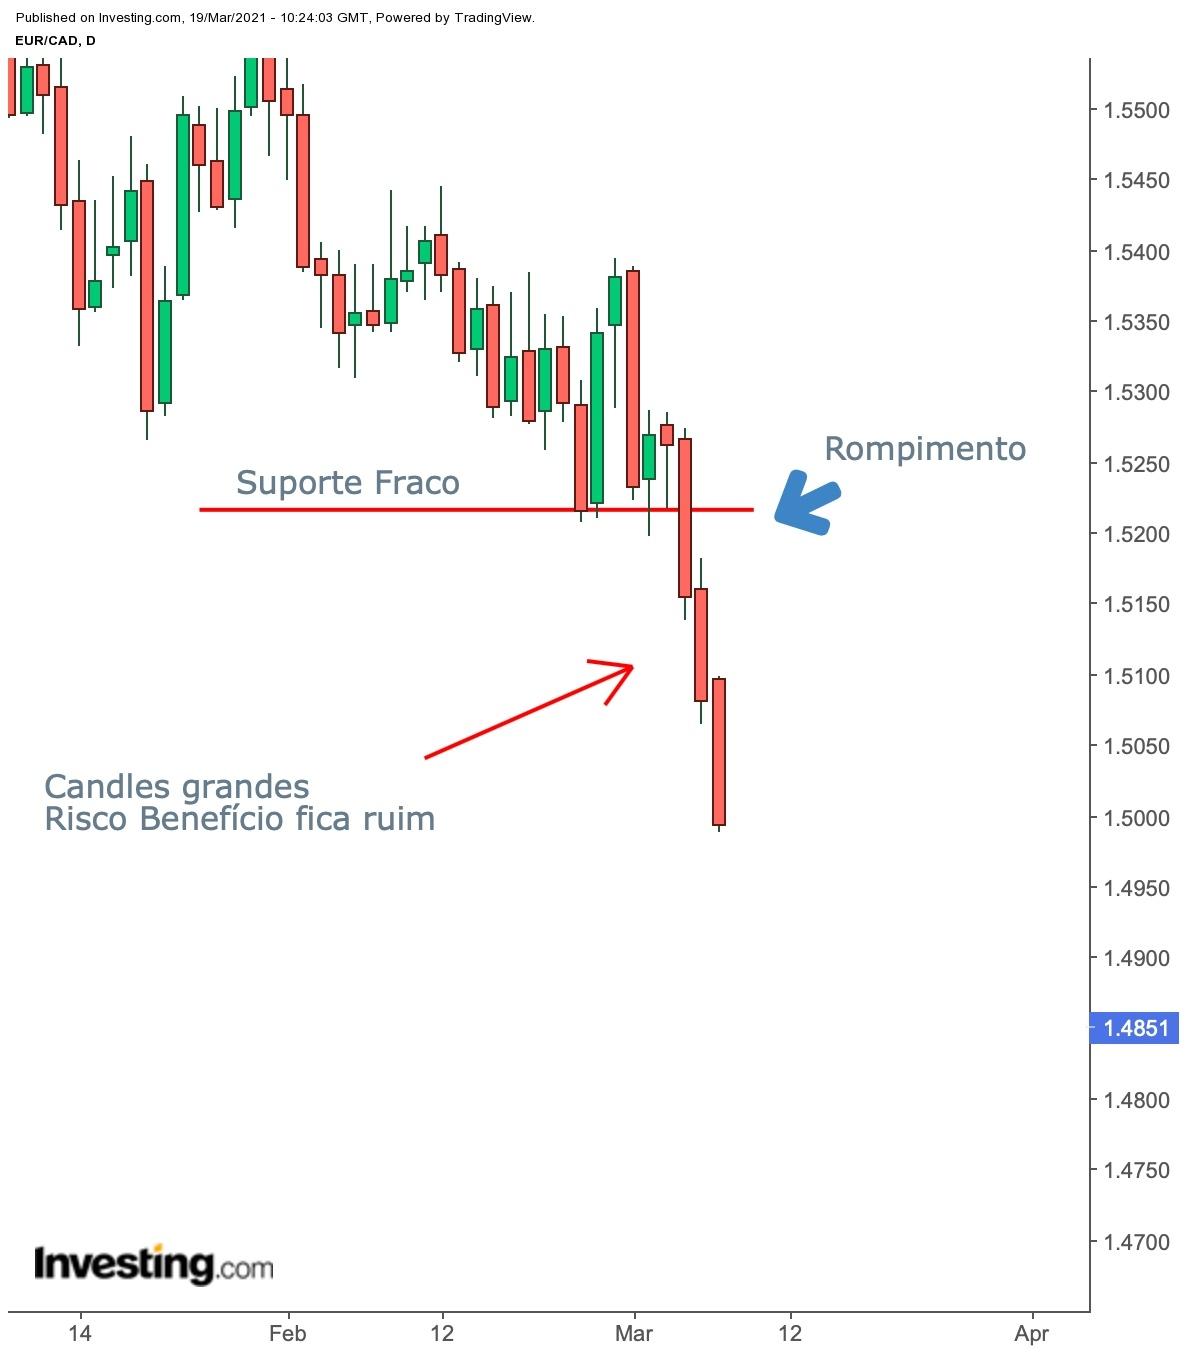 EUR/CAD - Rompimento Forte